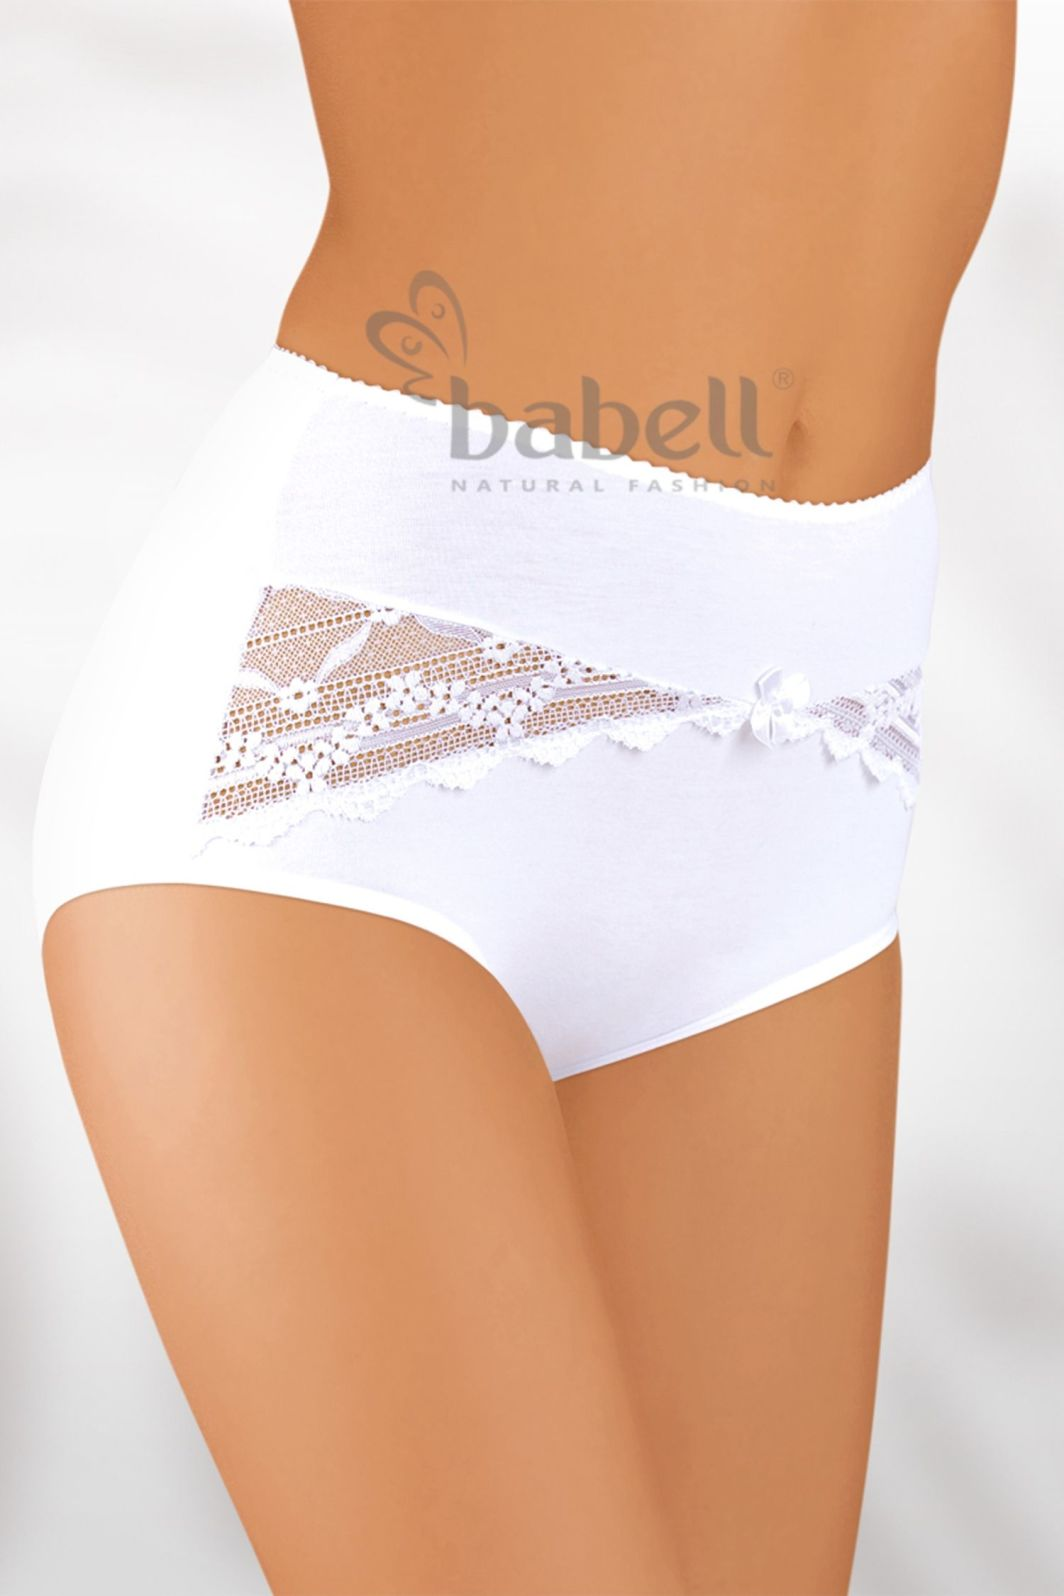 Babell Figi damskie BBL-004 białe r. M 1